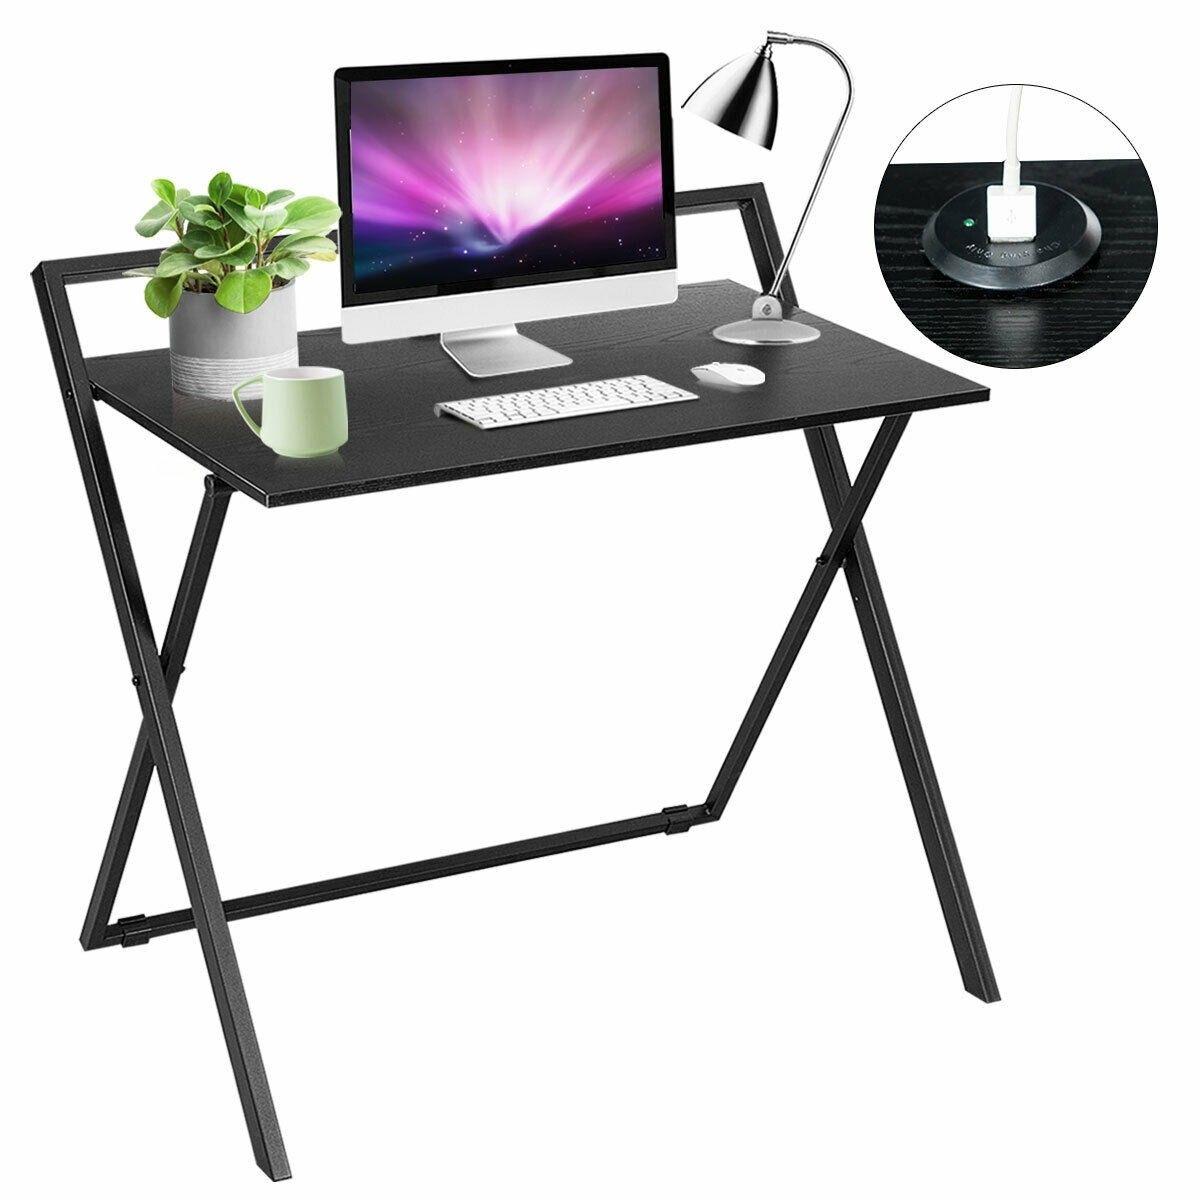 Folding Simple Pc Laptop Writing Table Computer Desk 85 95 Free